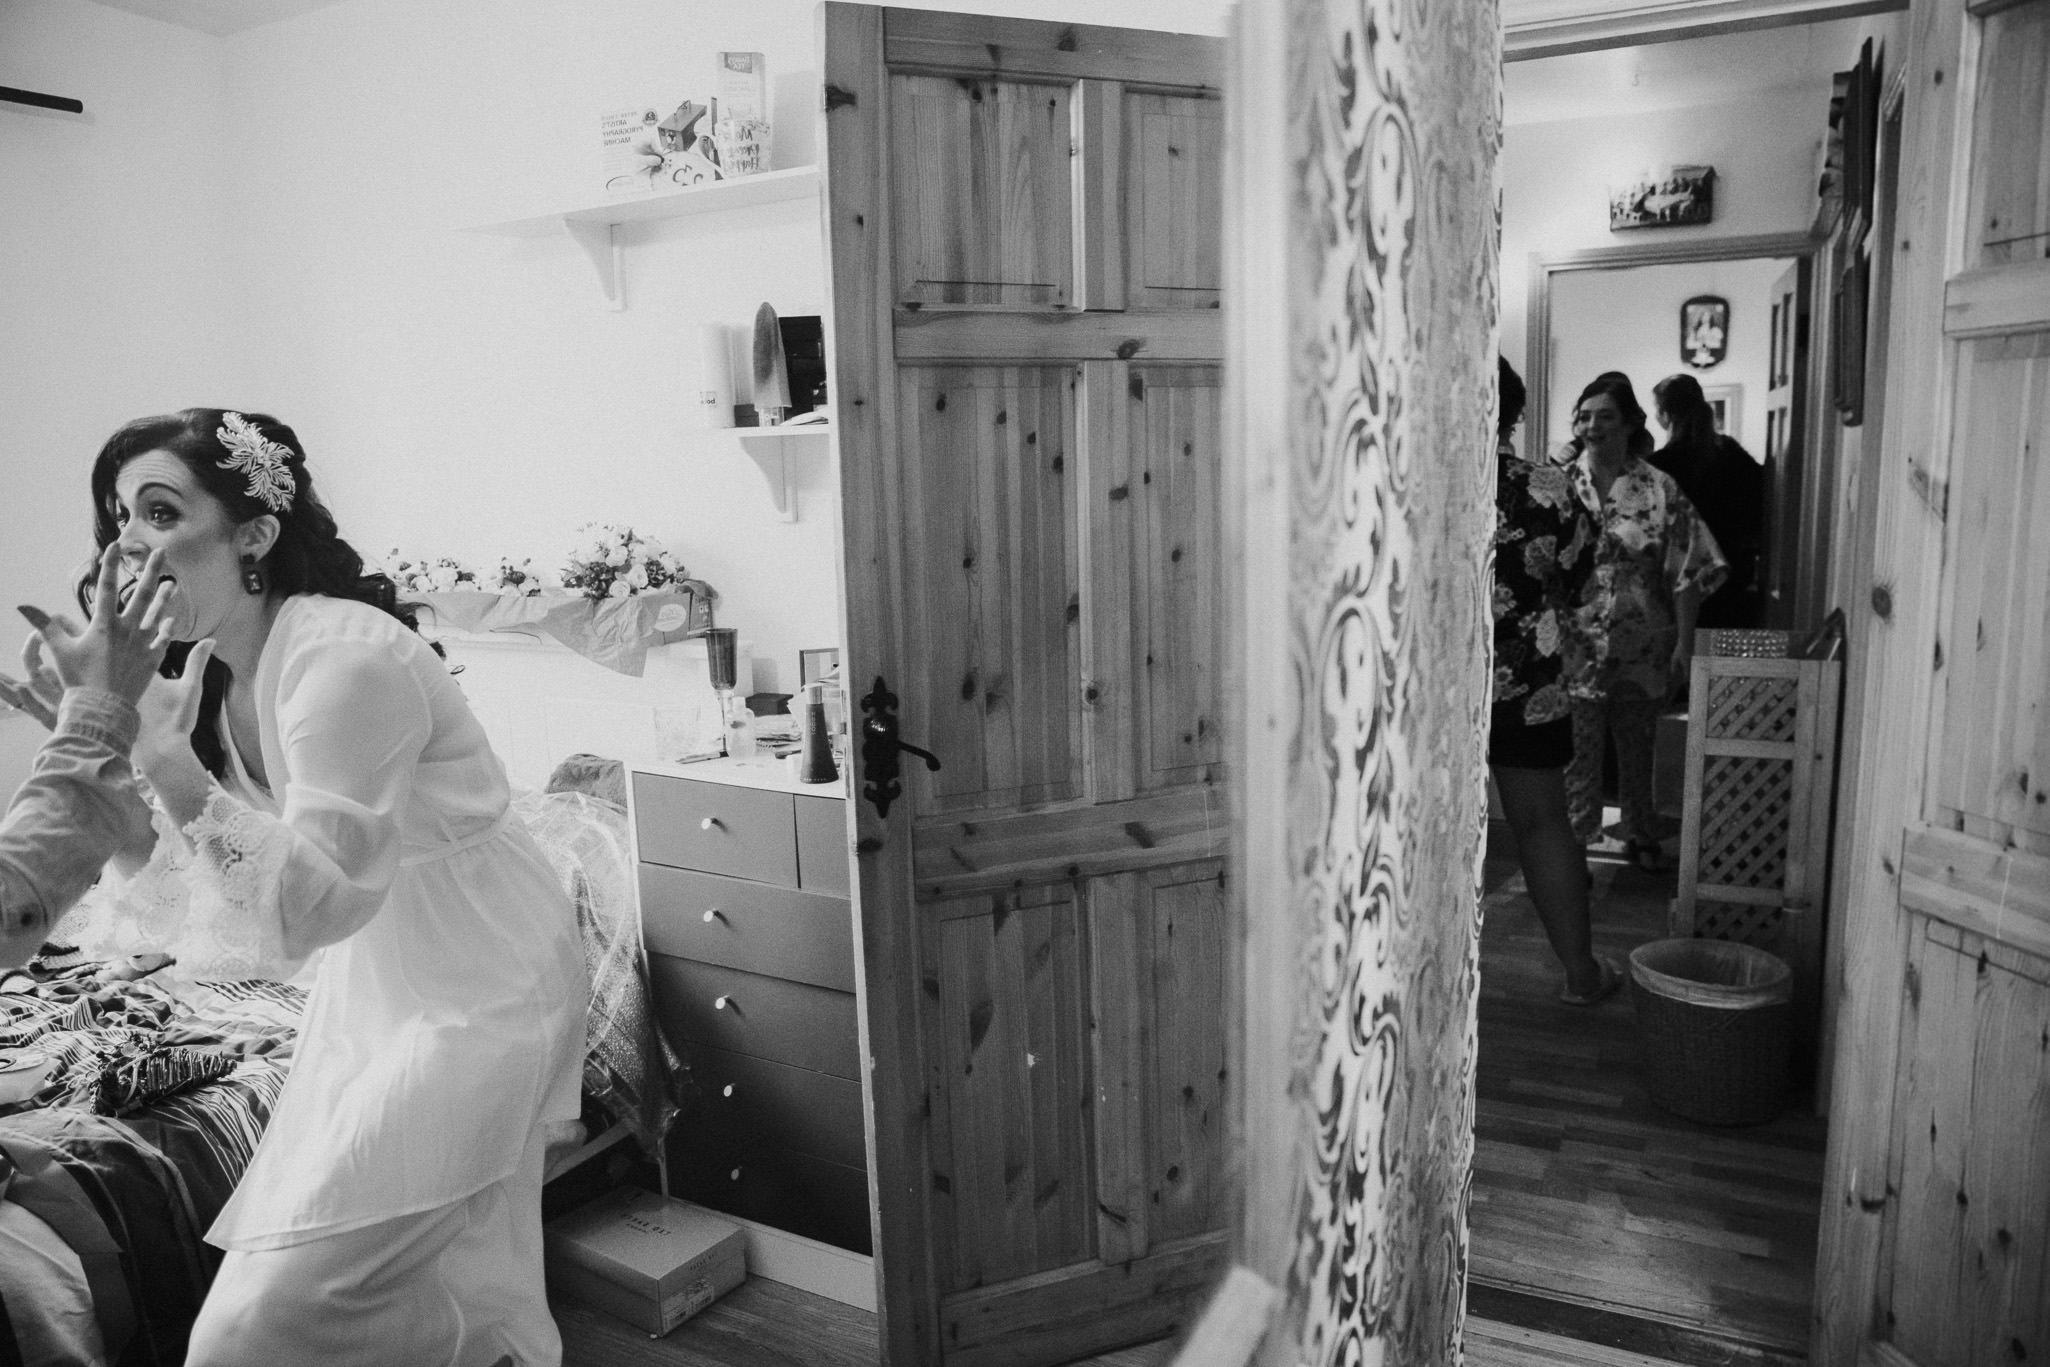 clairebyrnephotography-wedding-night-sparklers-new-years-eve-denyce-leonard-3.jpg